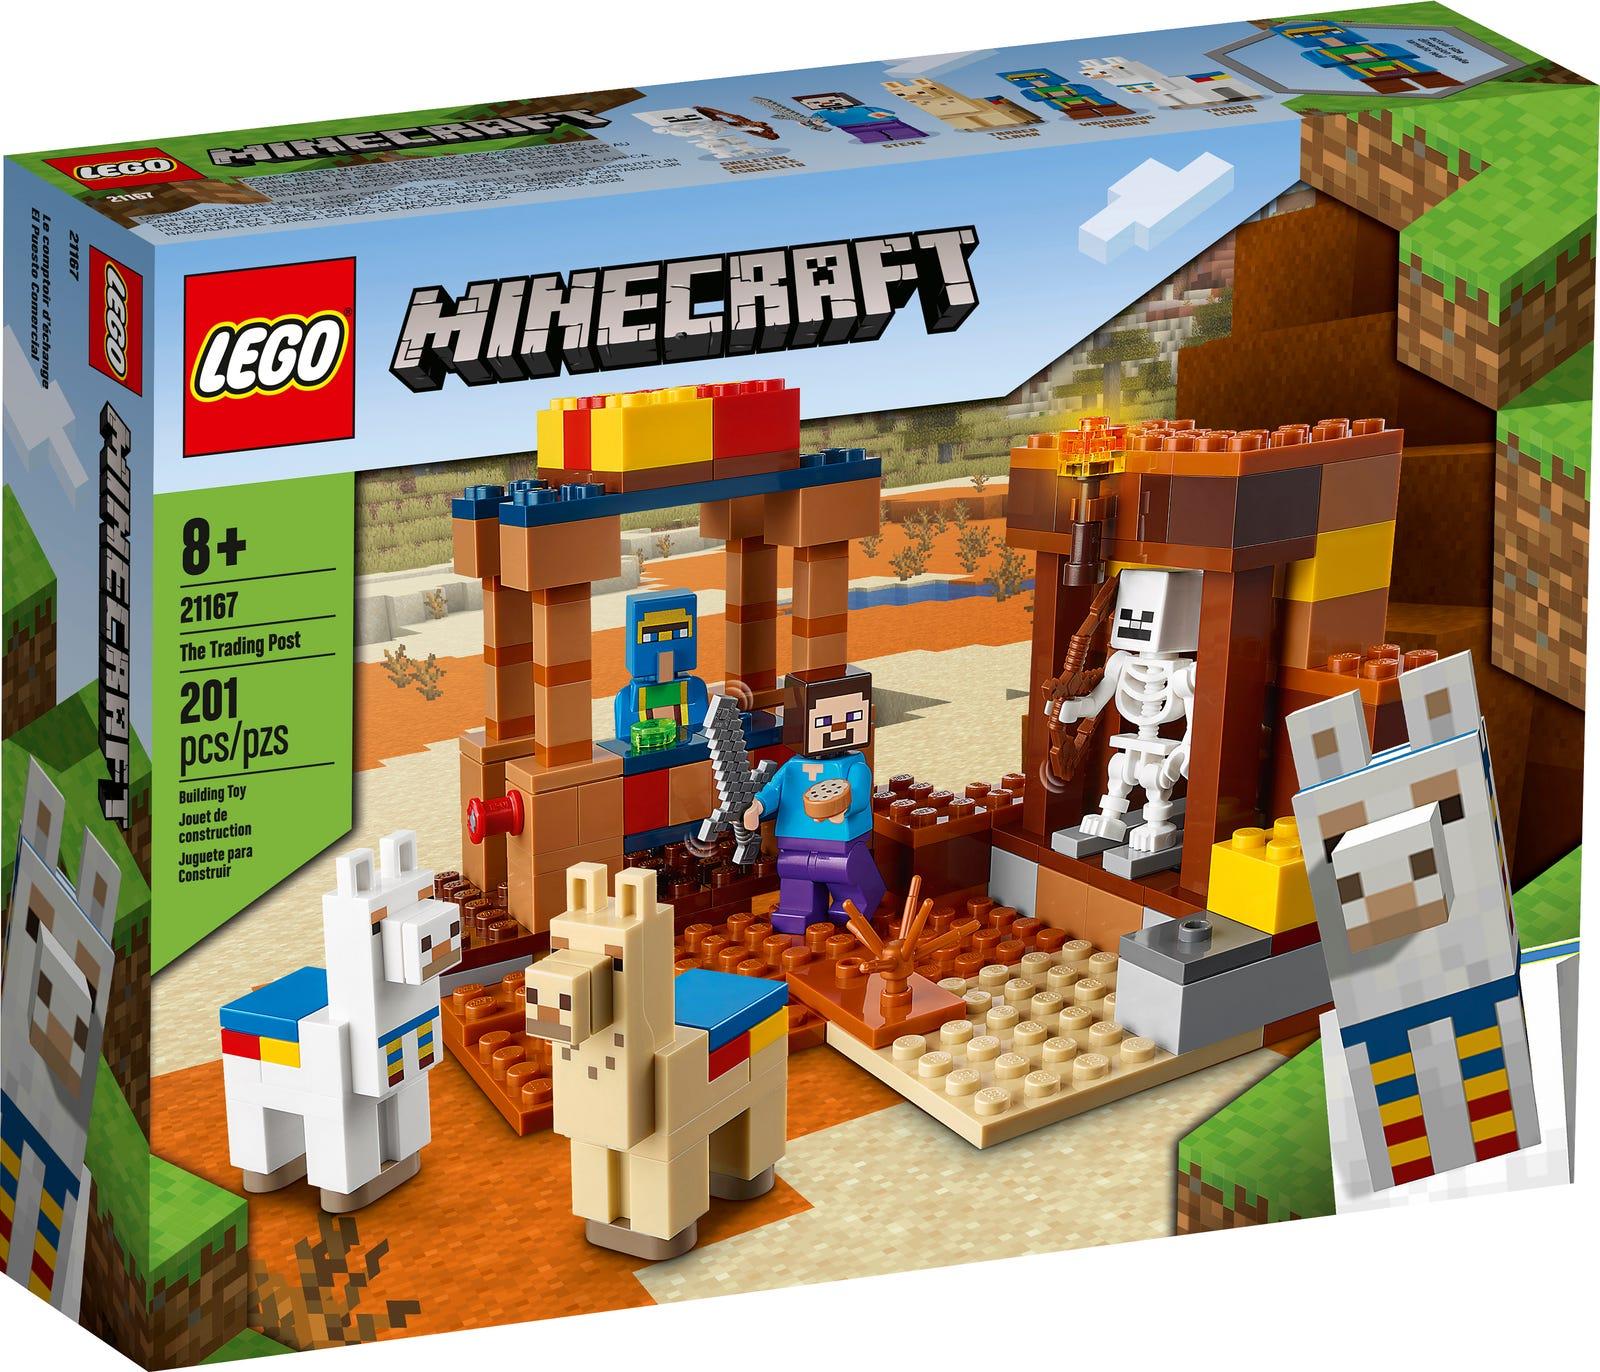 LEGO MINECRAFT IL TRADING POST 21167